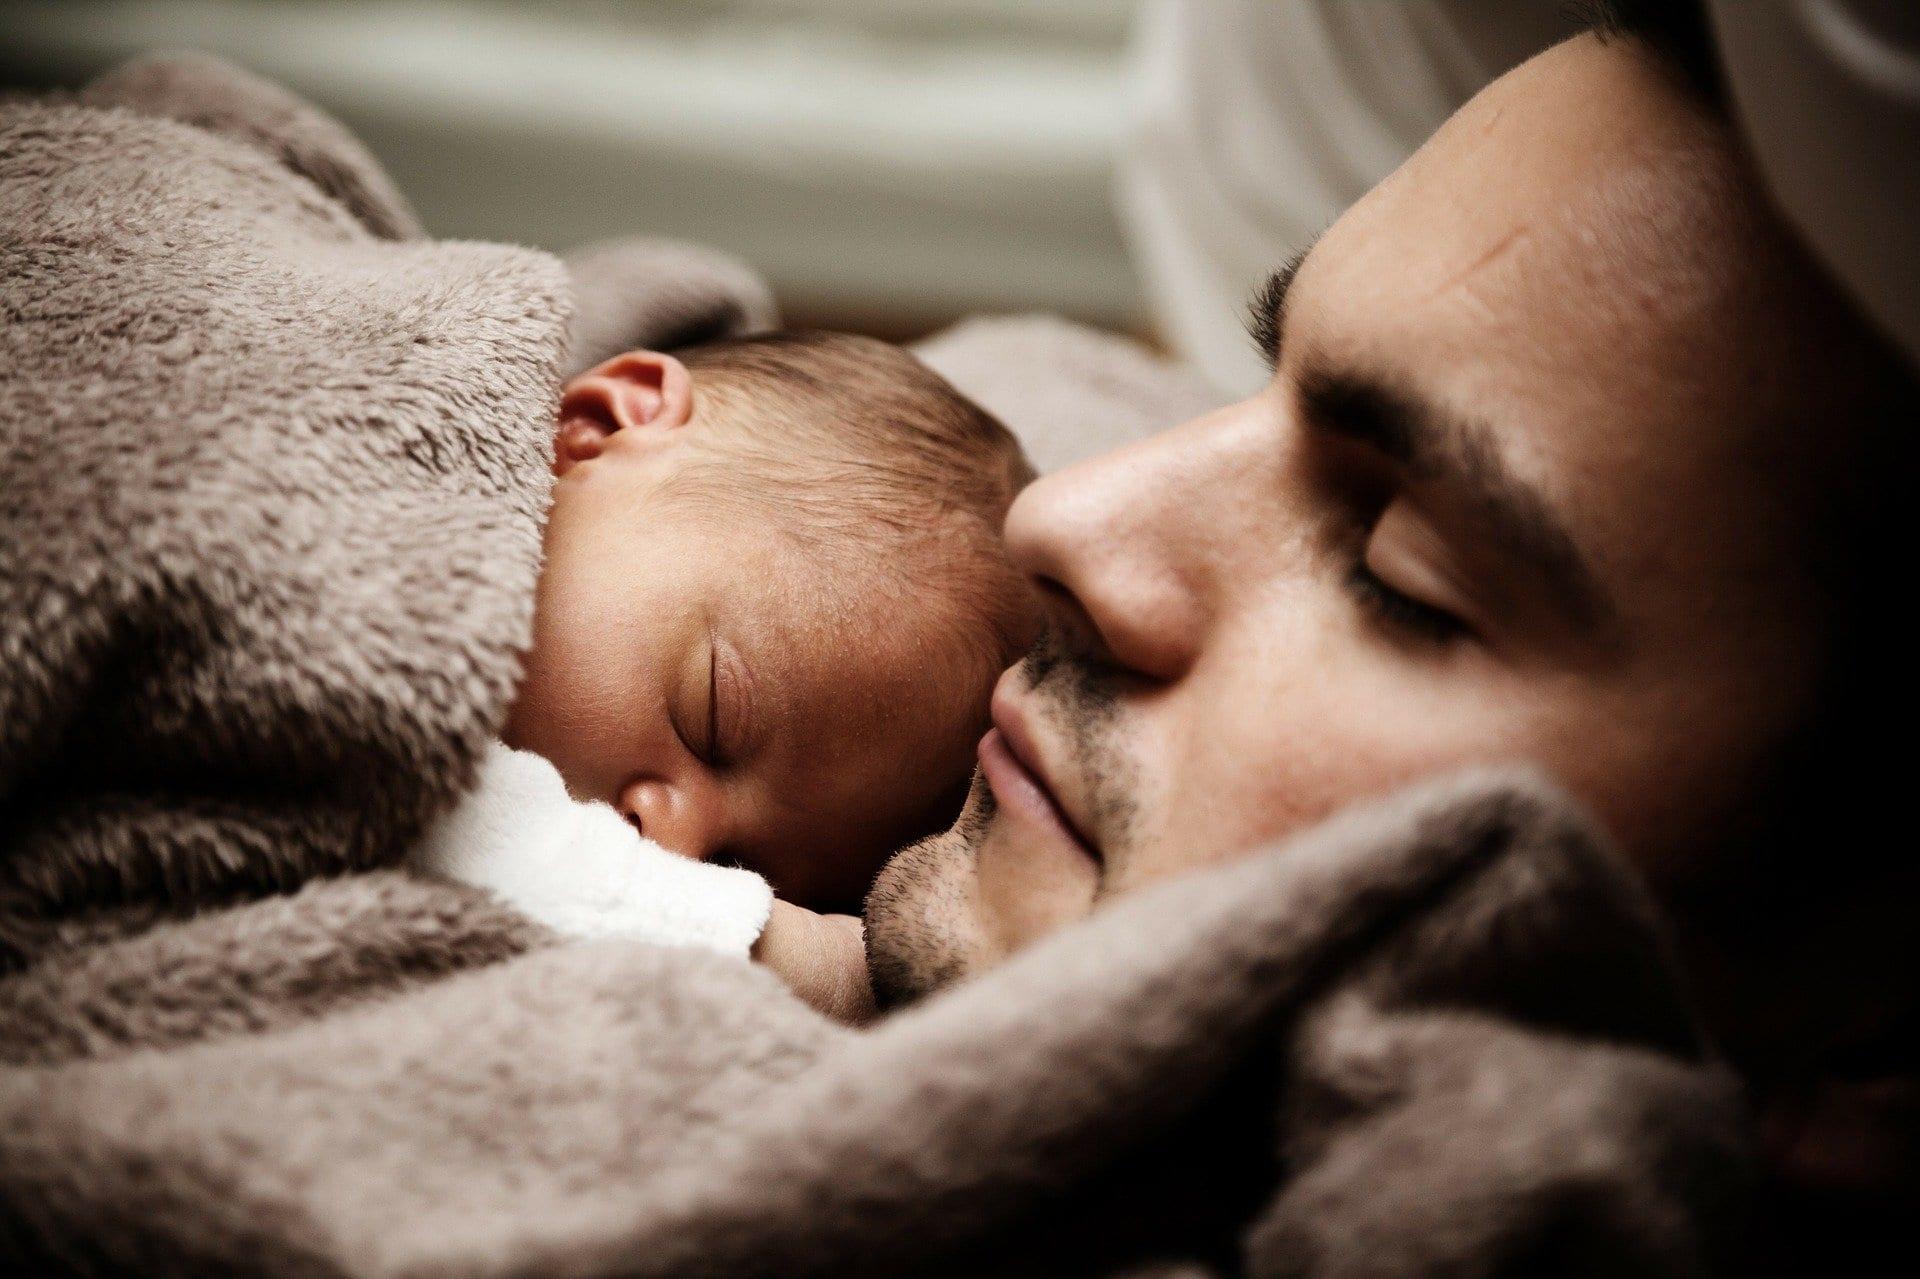 uomo e bambino dormono